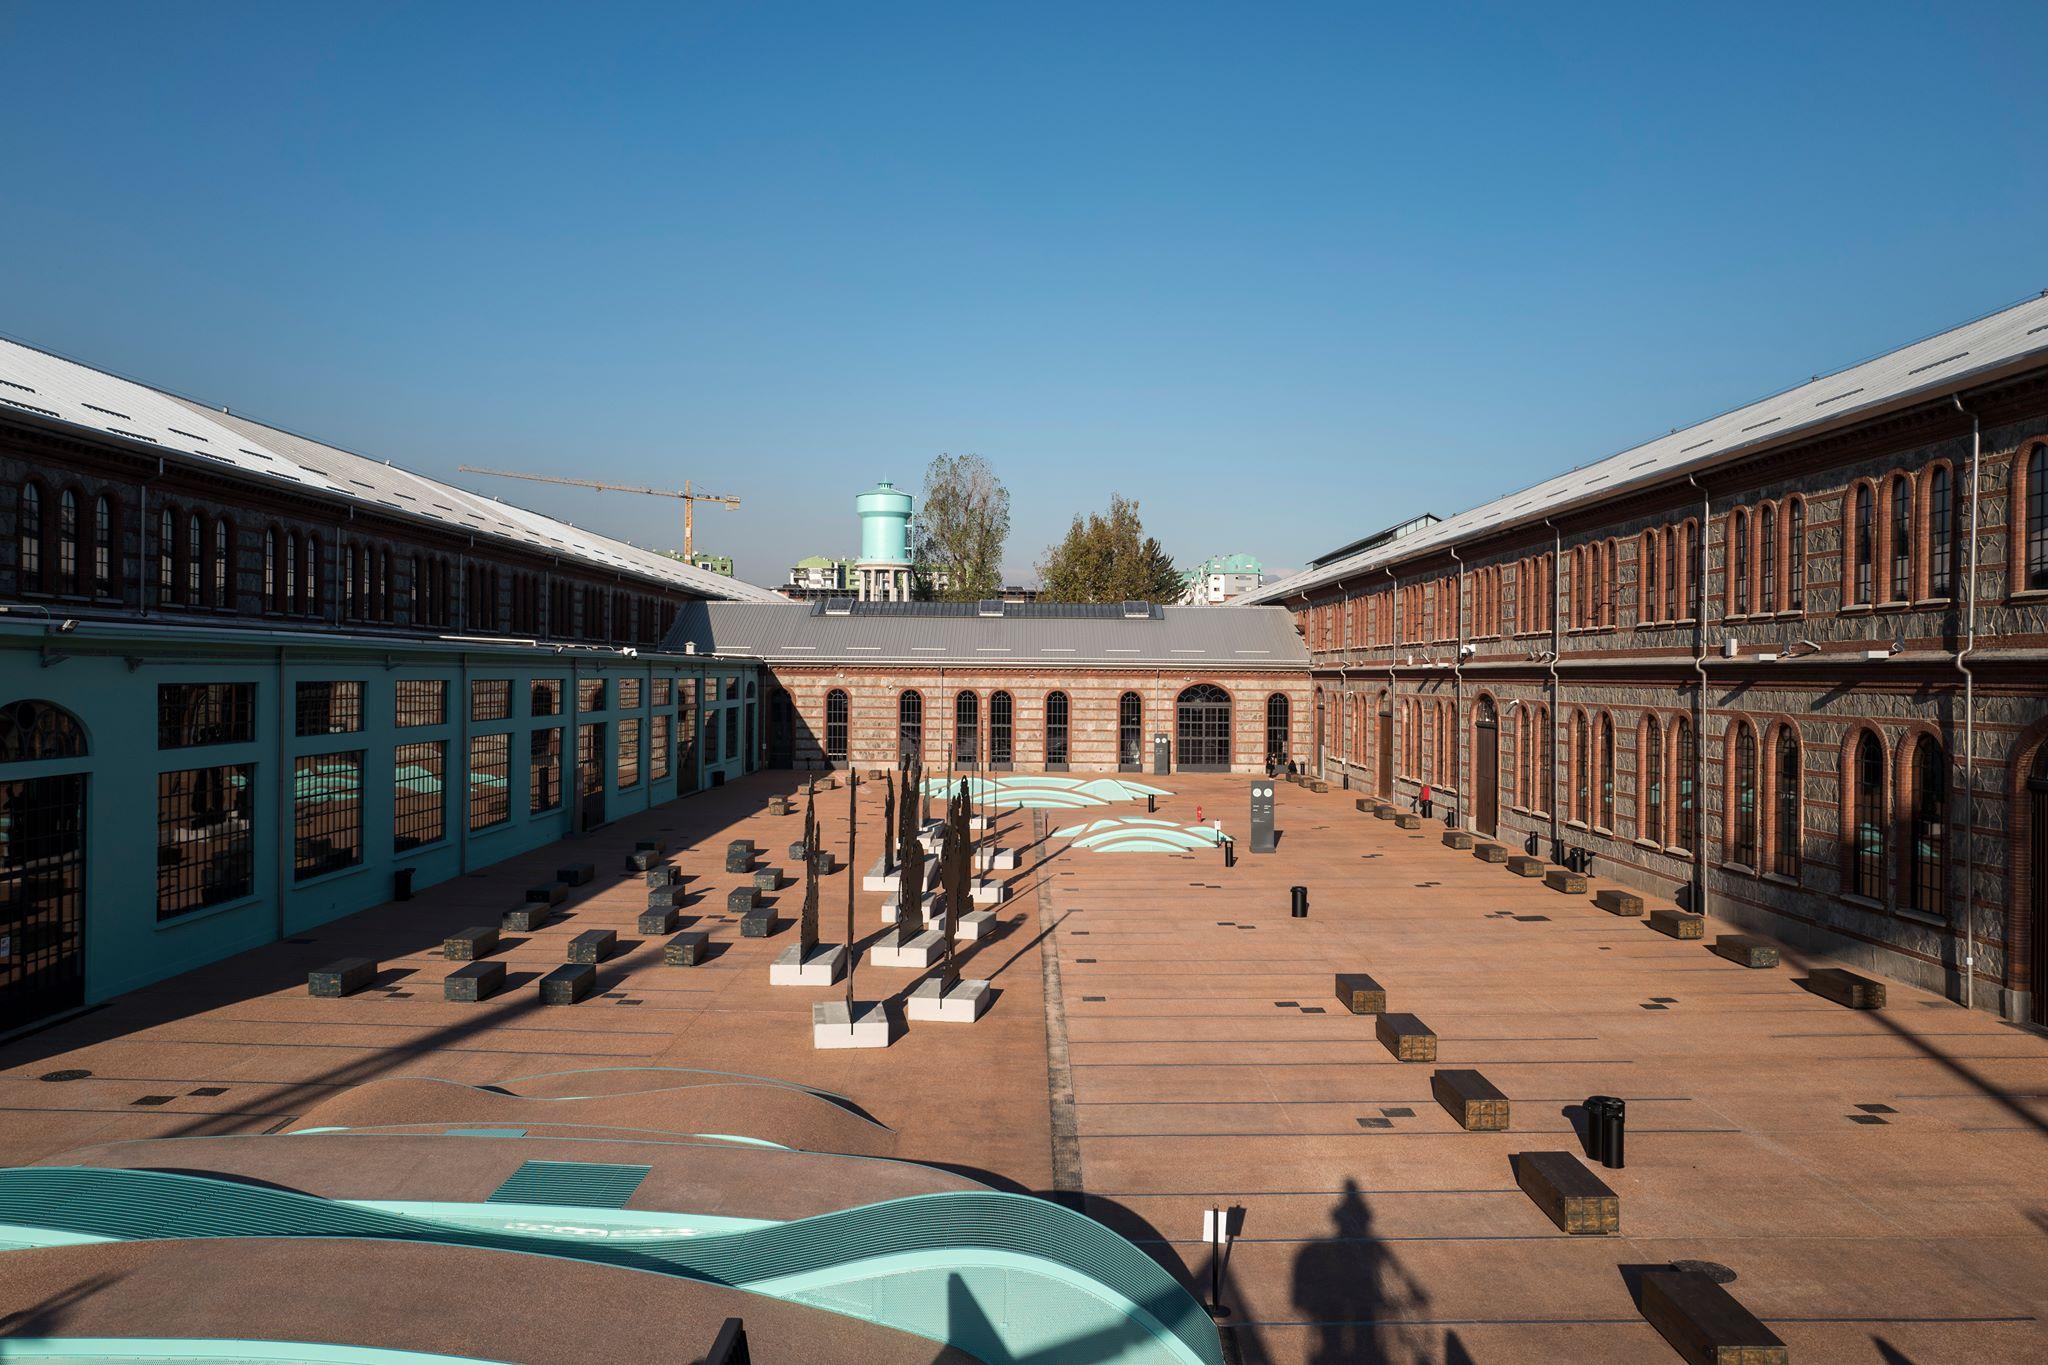 Al via l'Ogr Global Summit a Torino: l'acceleratore americano Techstars debutta in città